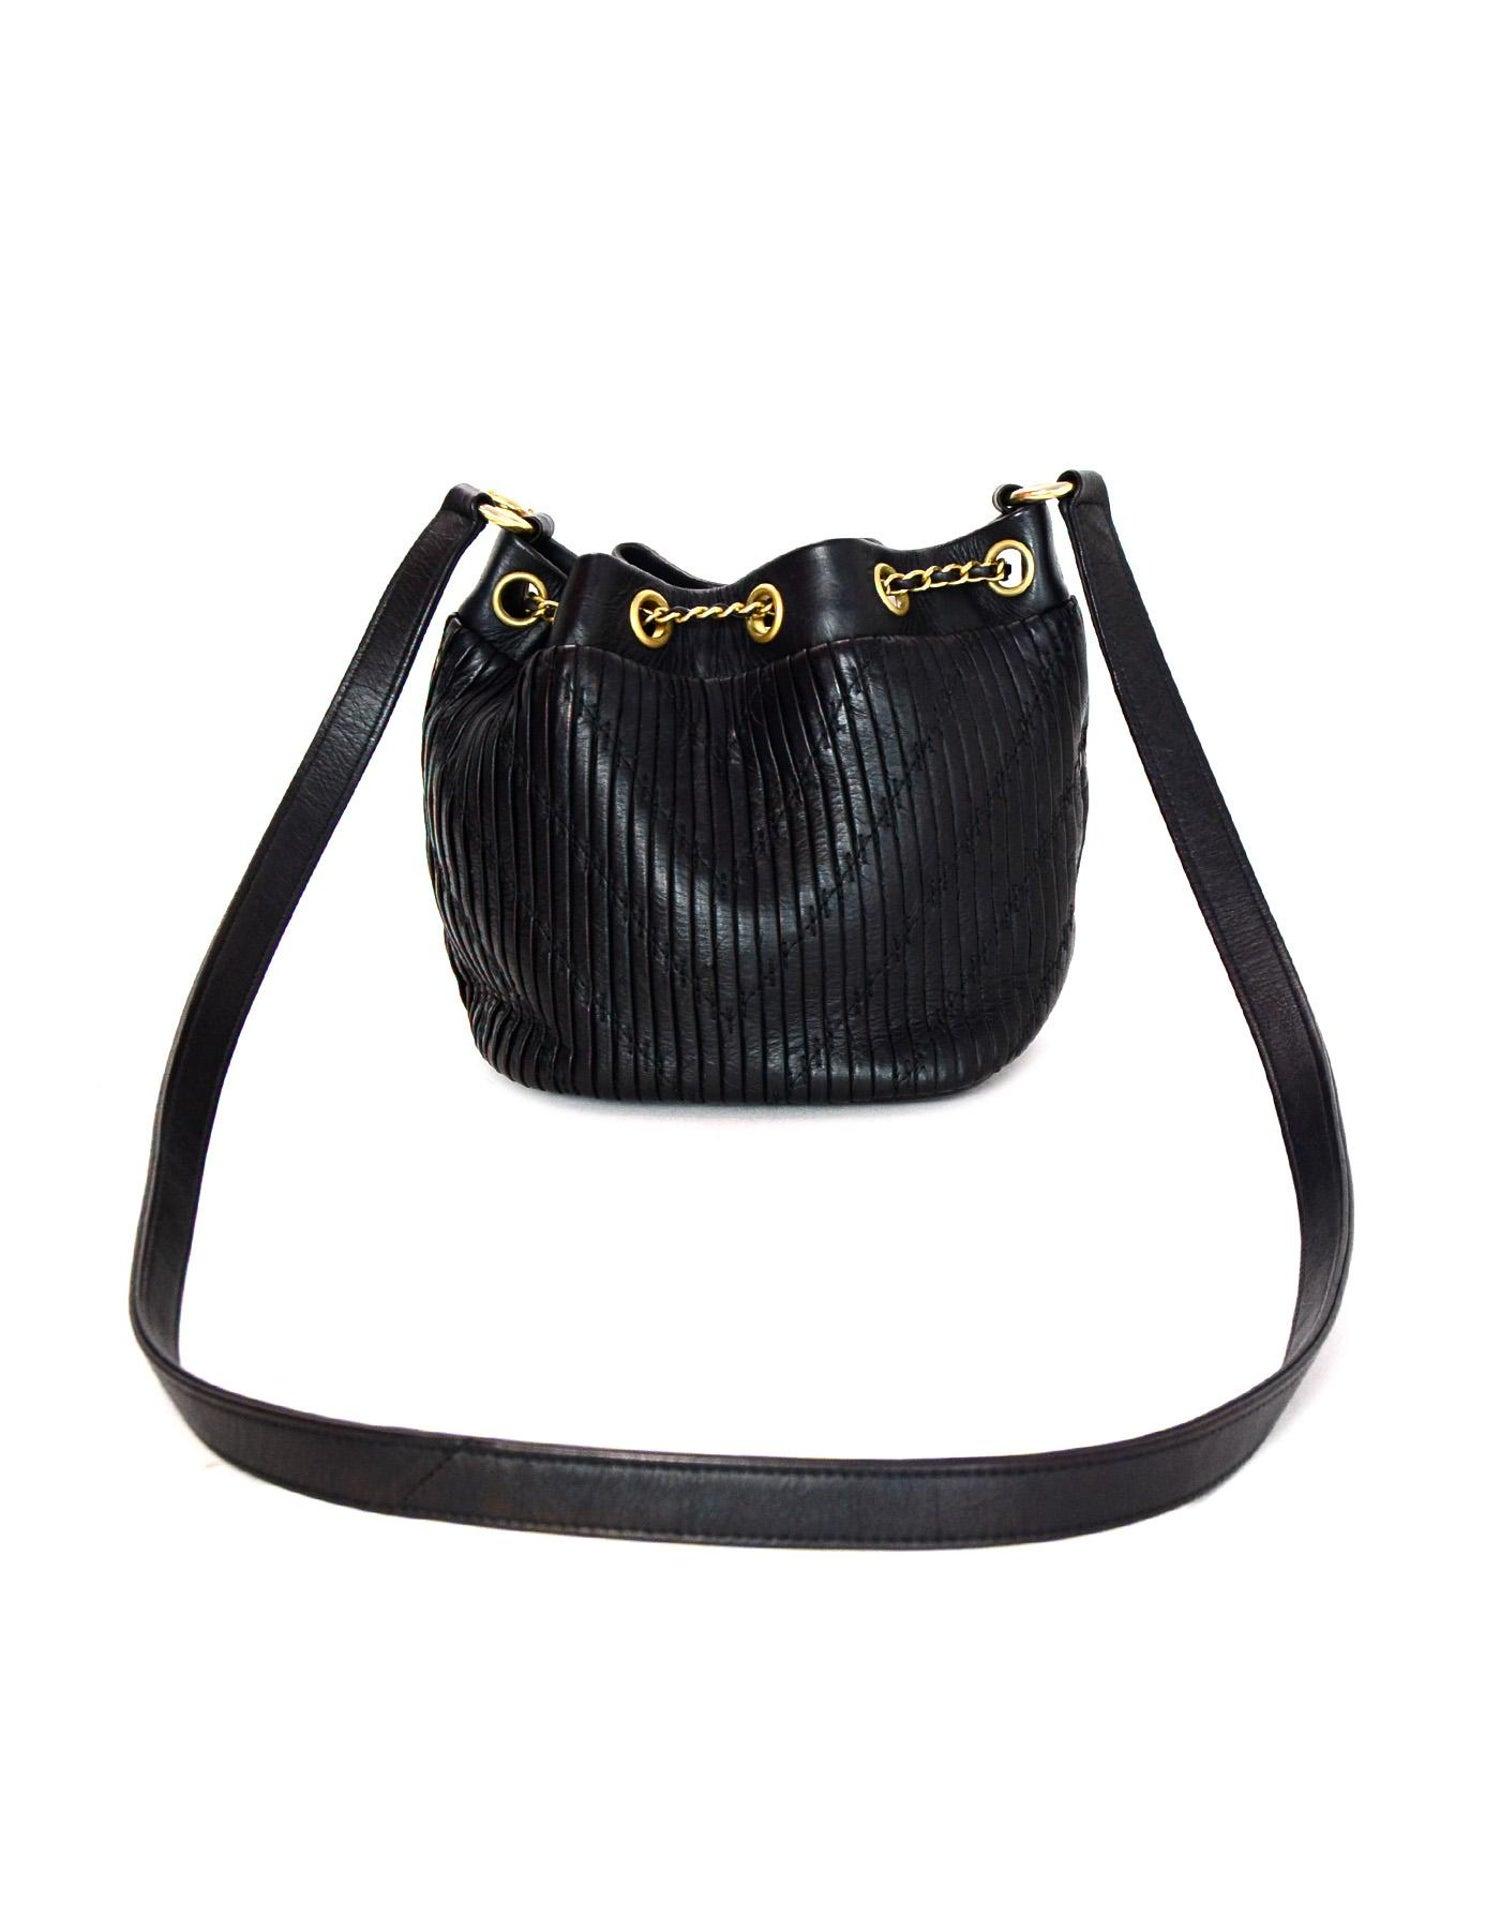 Chanel 2018 Black Leather Coco Pleats Mini CC Chain Drawstring Bucket Bag  For Sale at 1stdibs b09df7e58ea8e